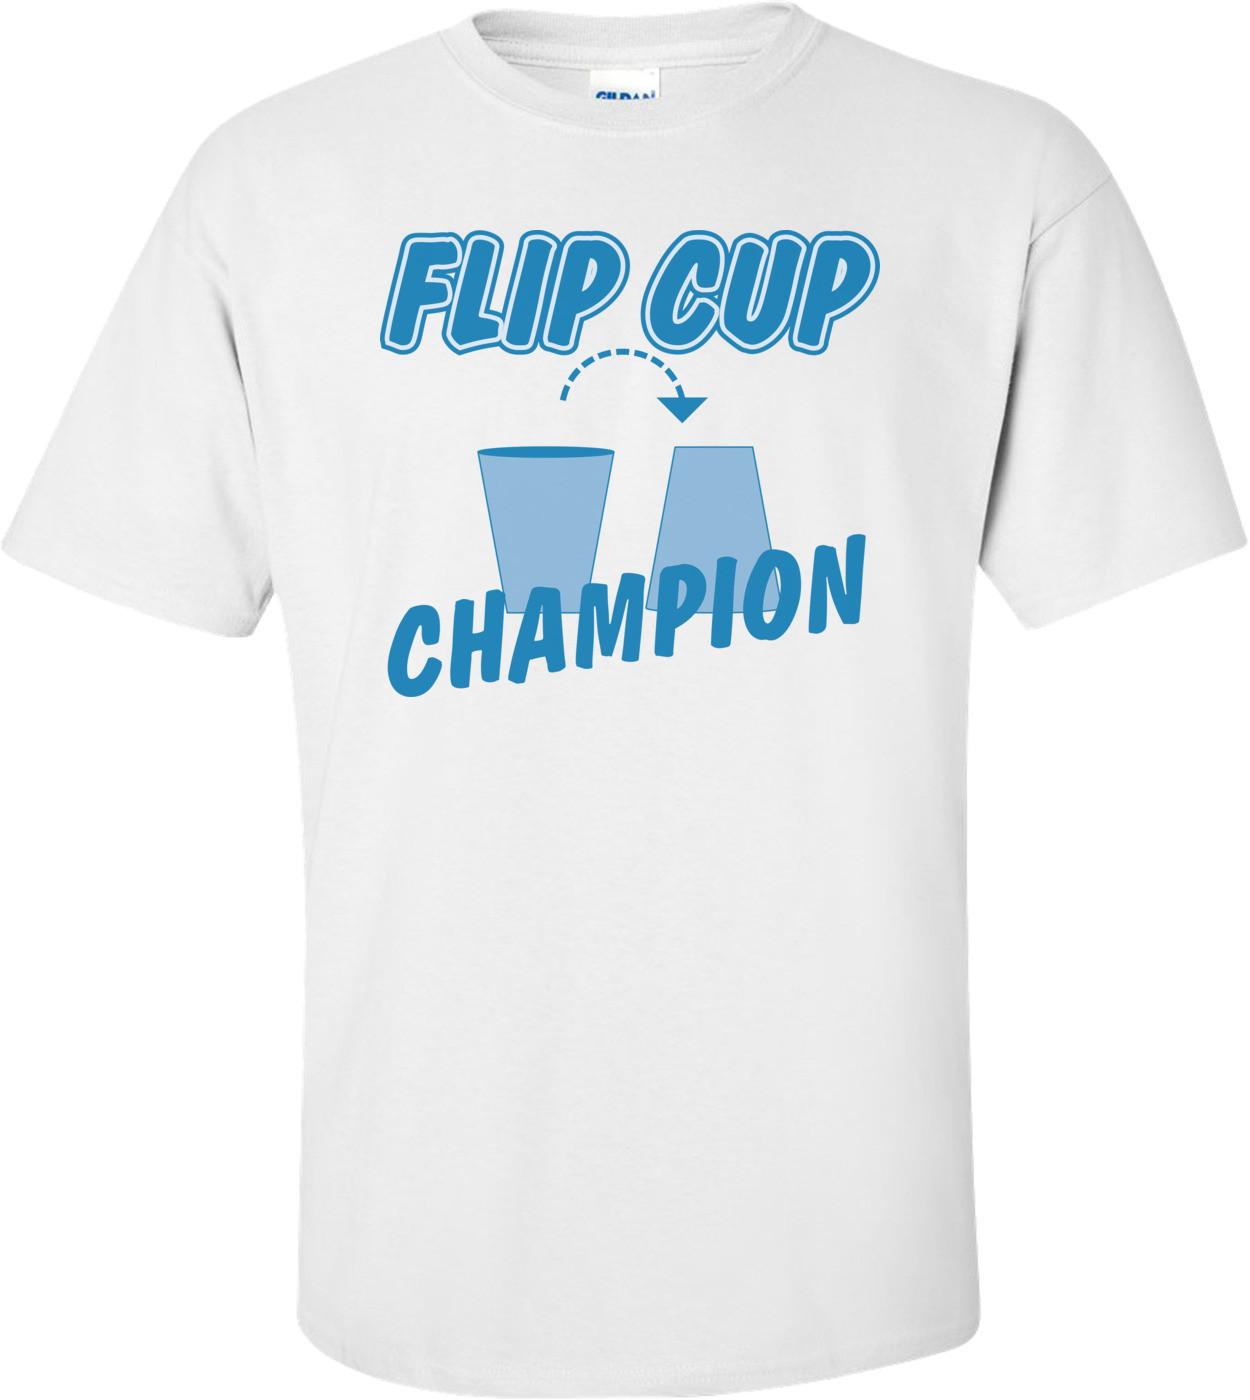 Flip Cup Champion Drinking Shirt